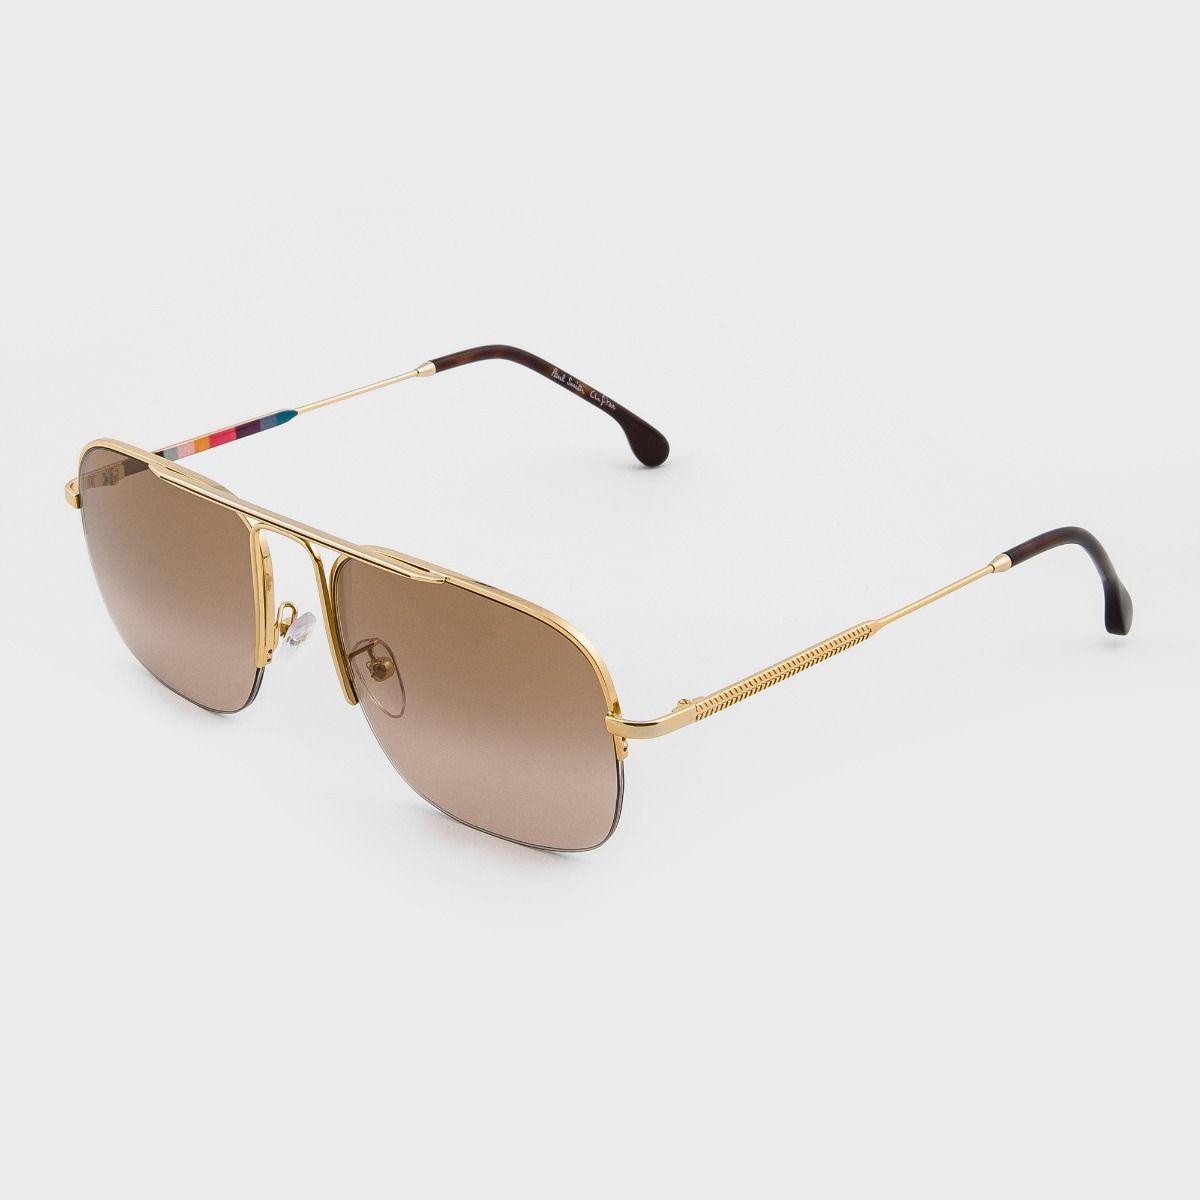 Paul Smith Clifton Rectangle Sunglasses